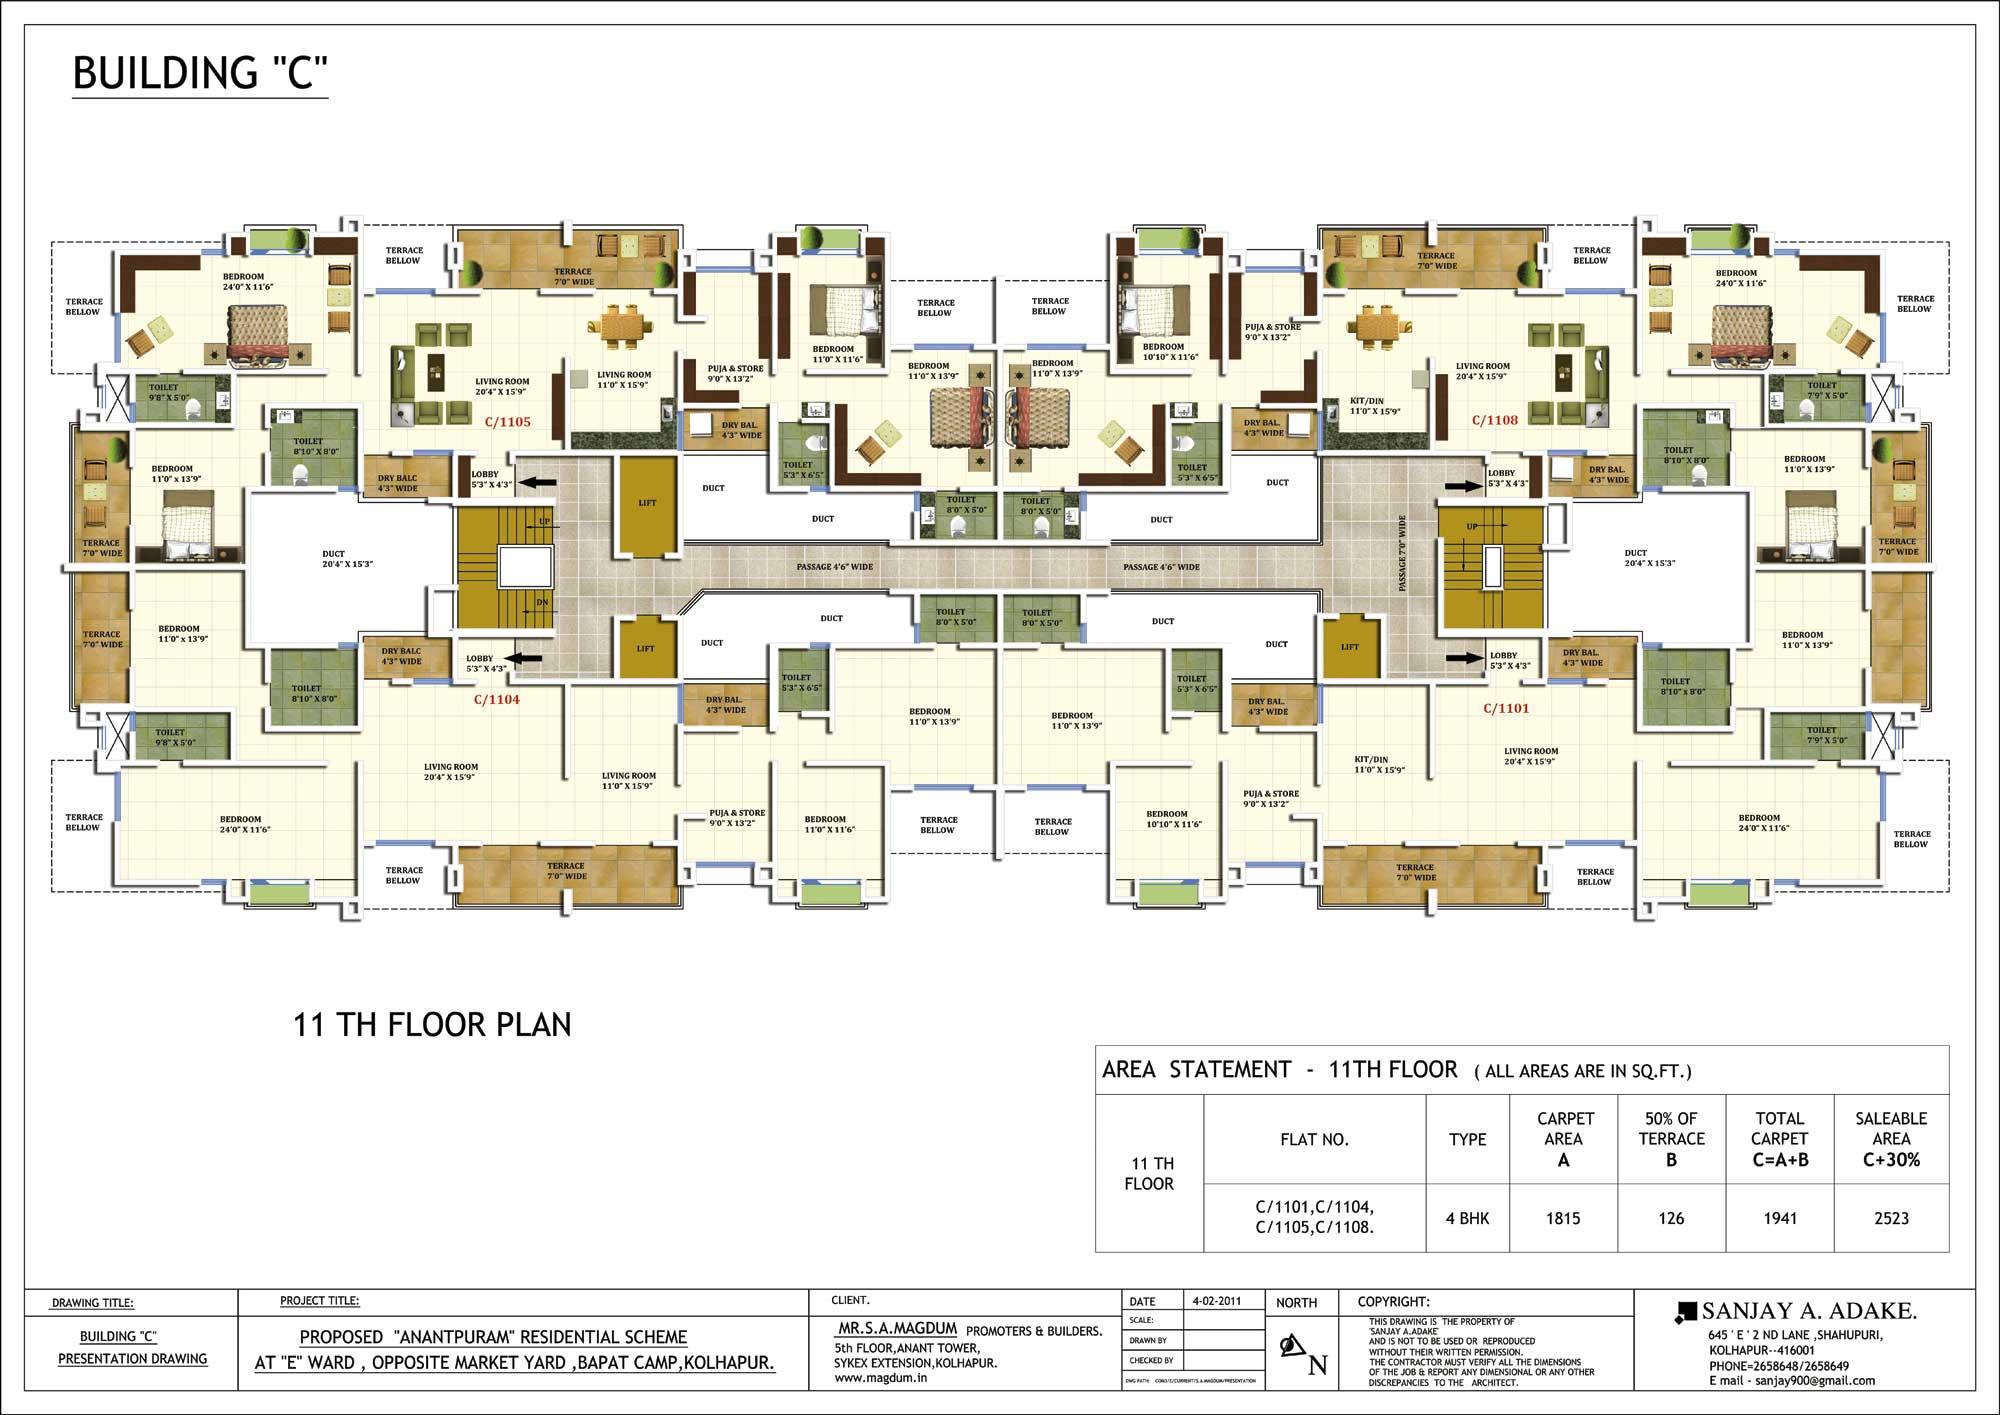 mail floorplan. C Building - 11th Floor Plan Mail Floorplan P